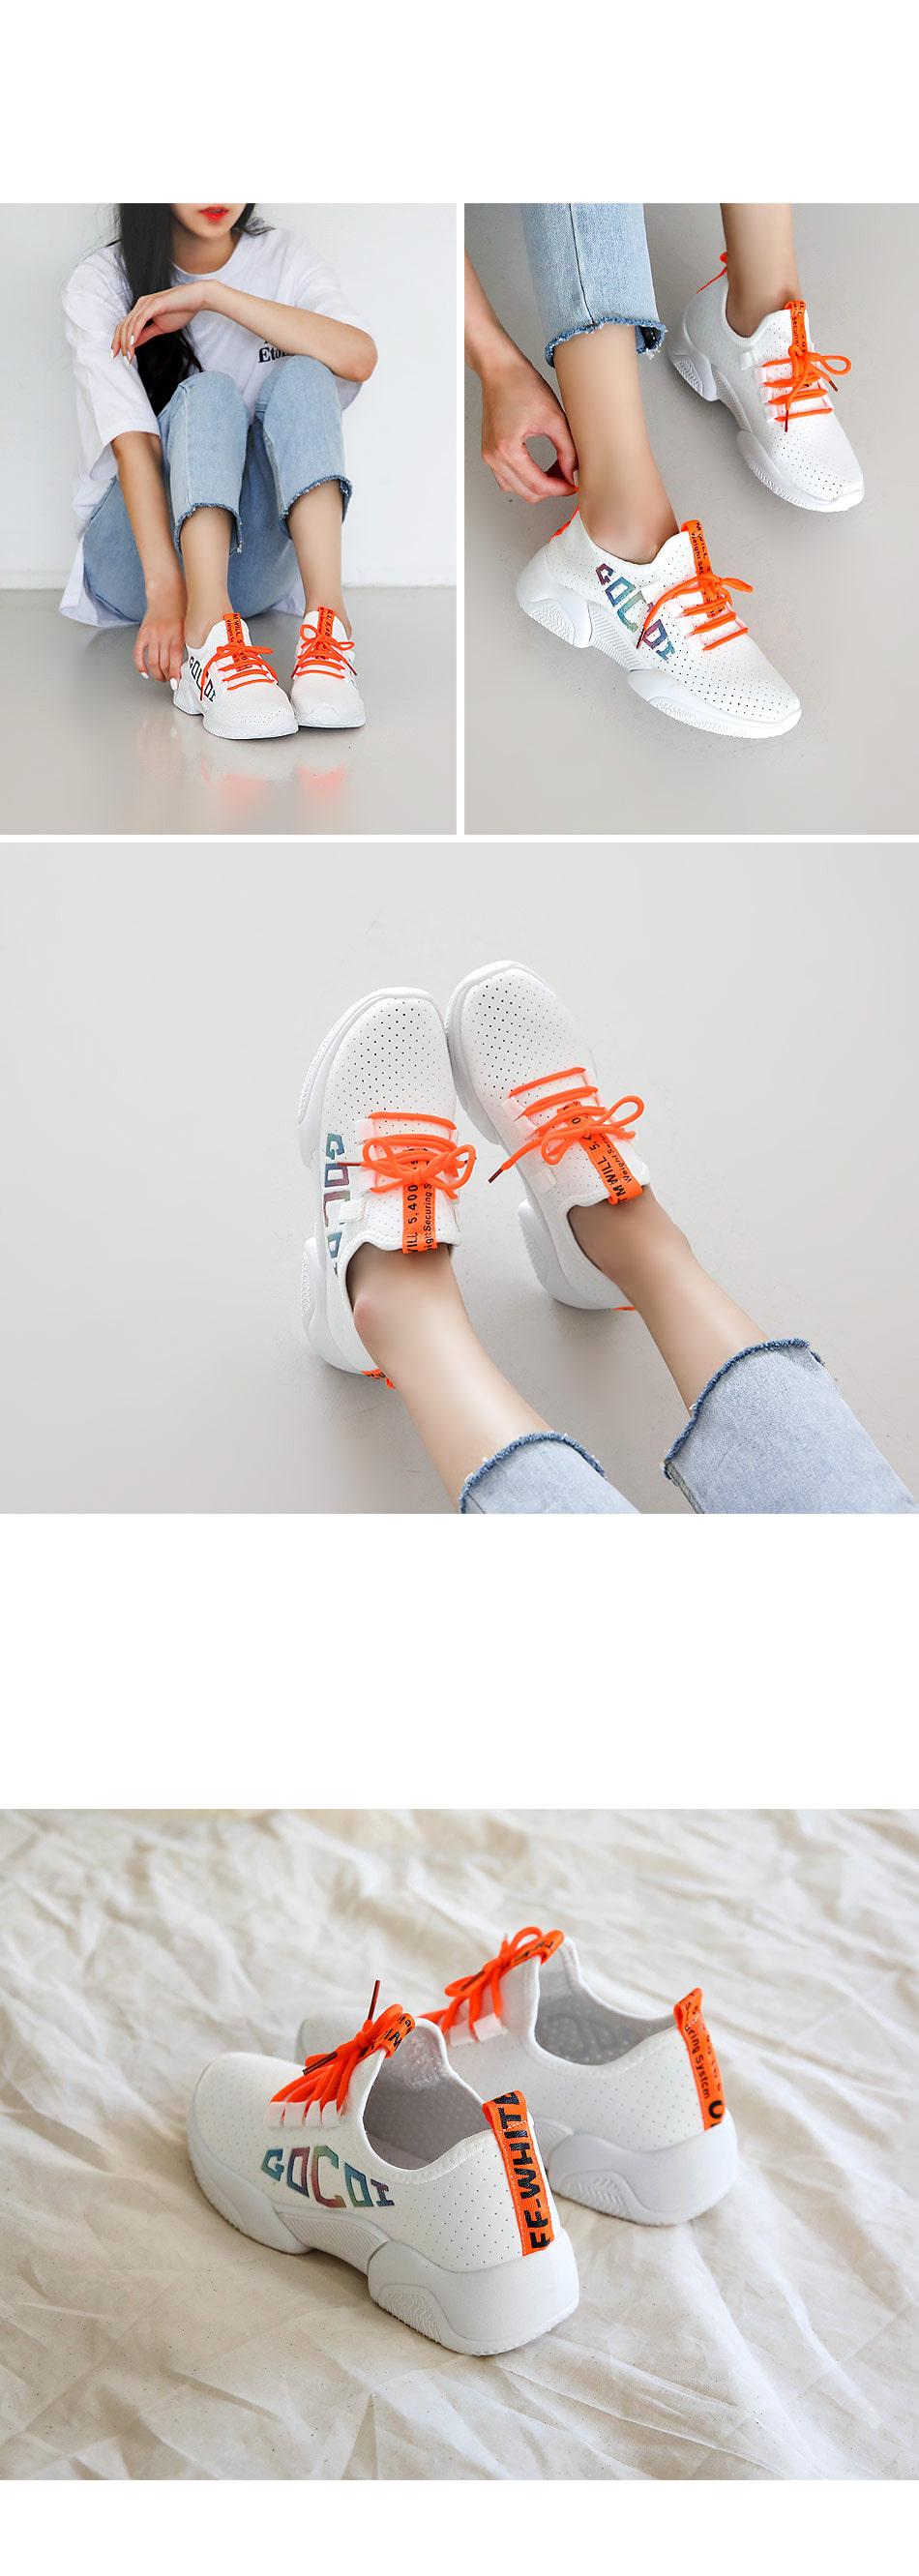 Corens Neon Socks Sneakers 4cm